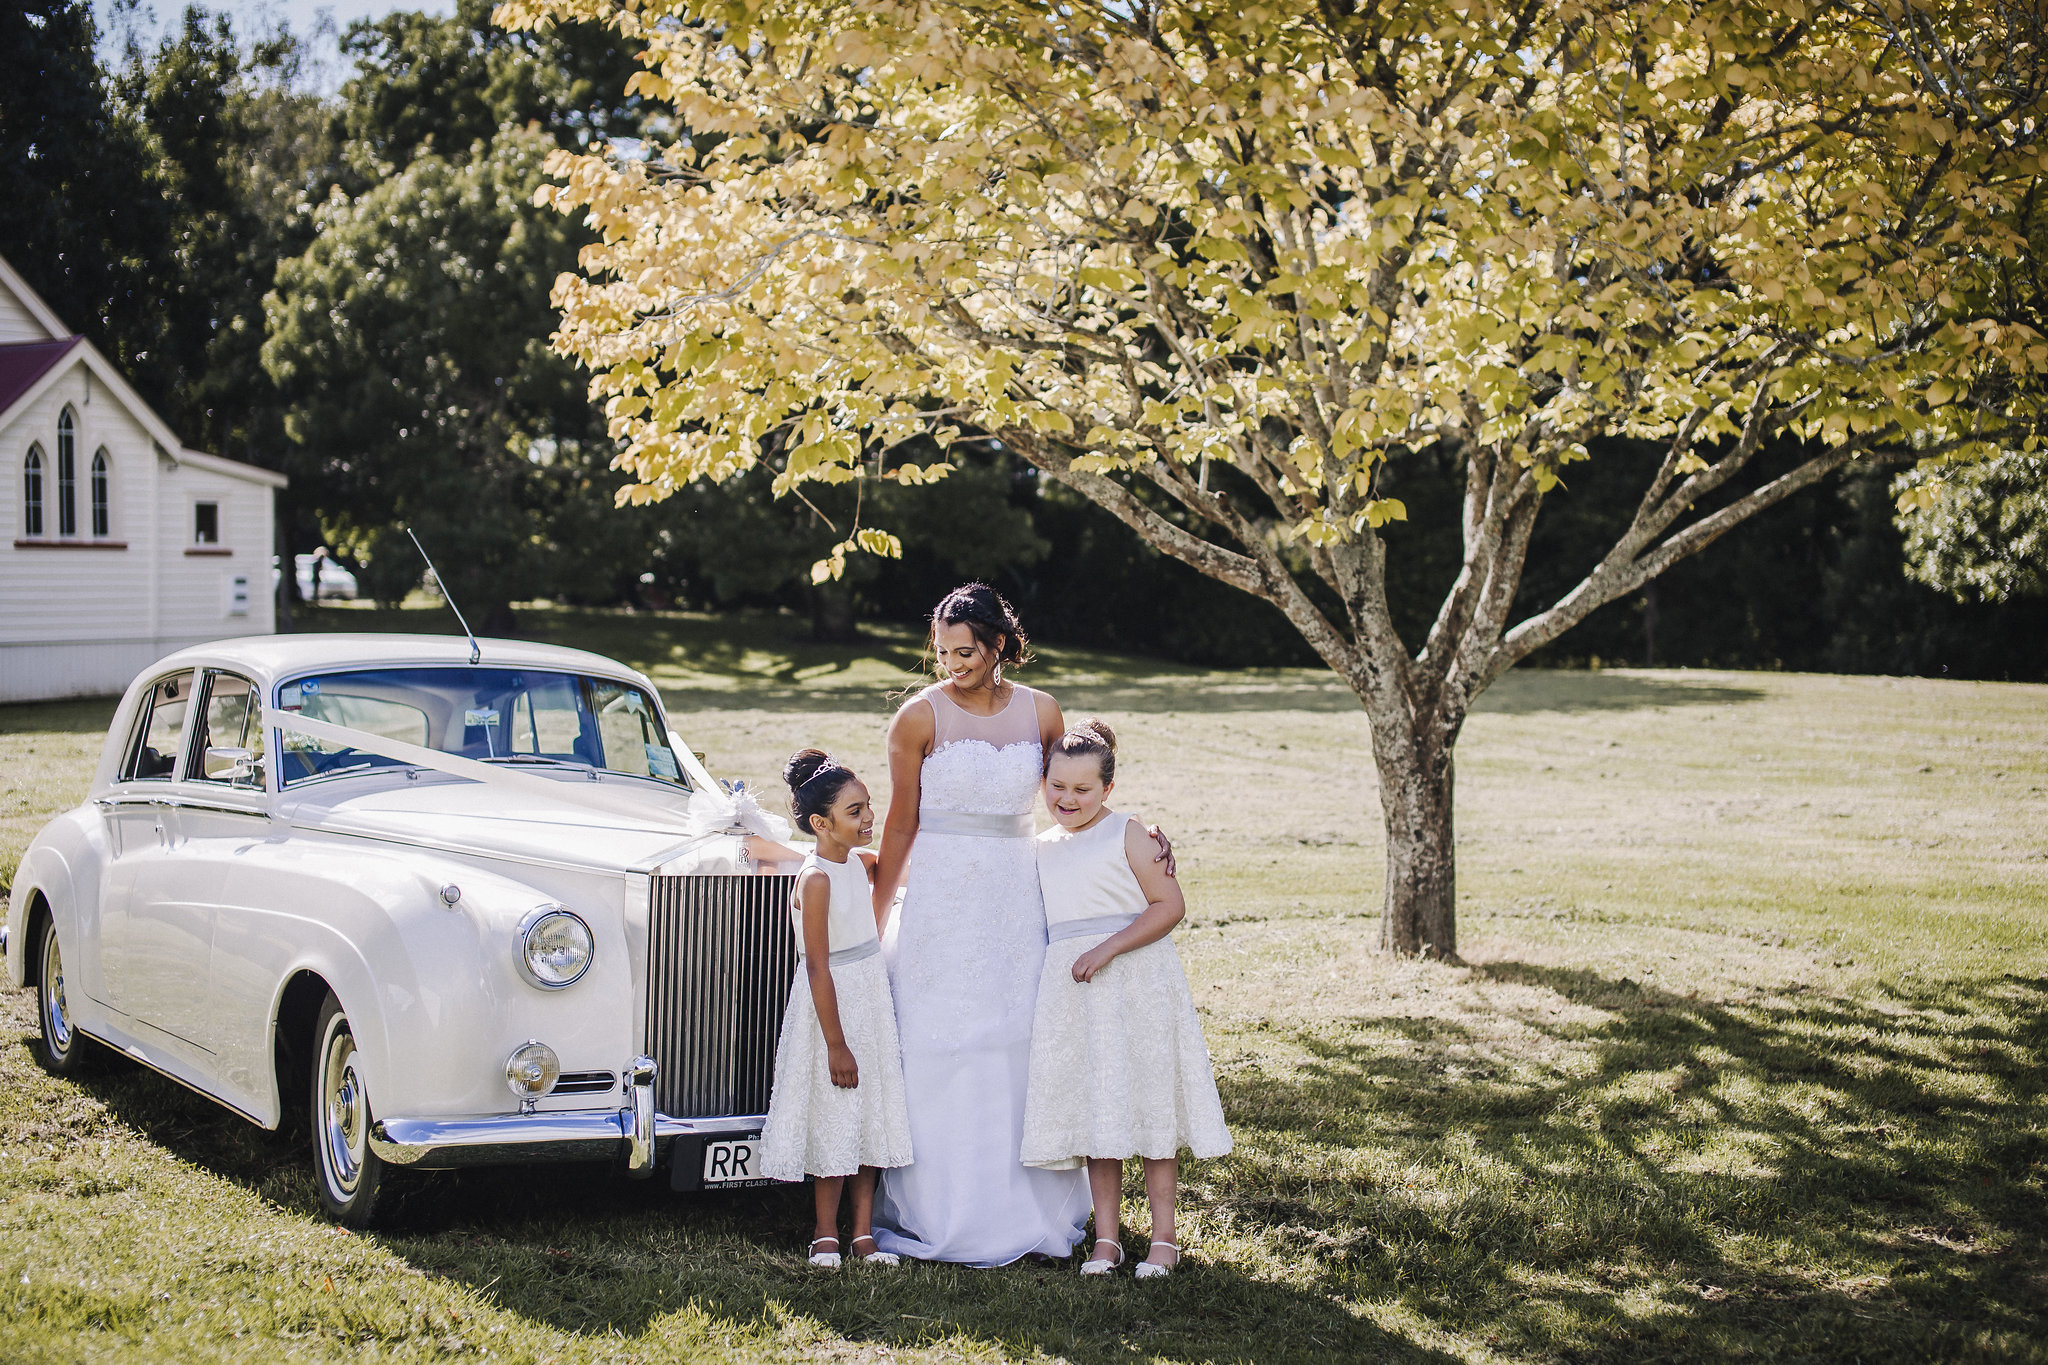 K_P_wedding_006.jpg